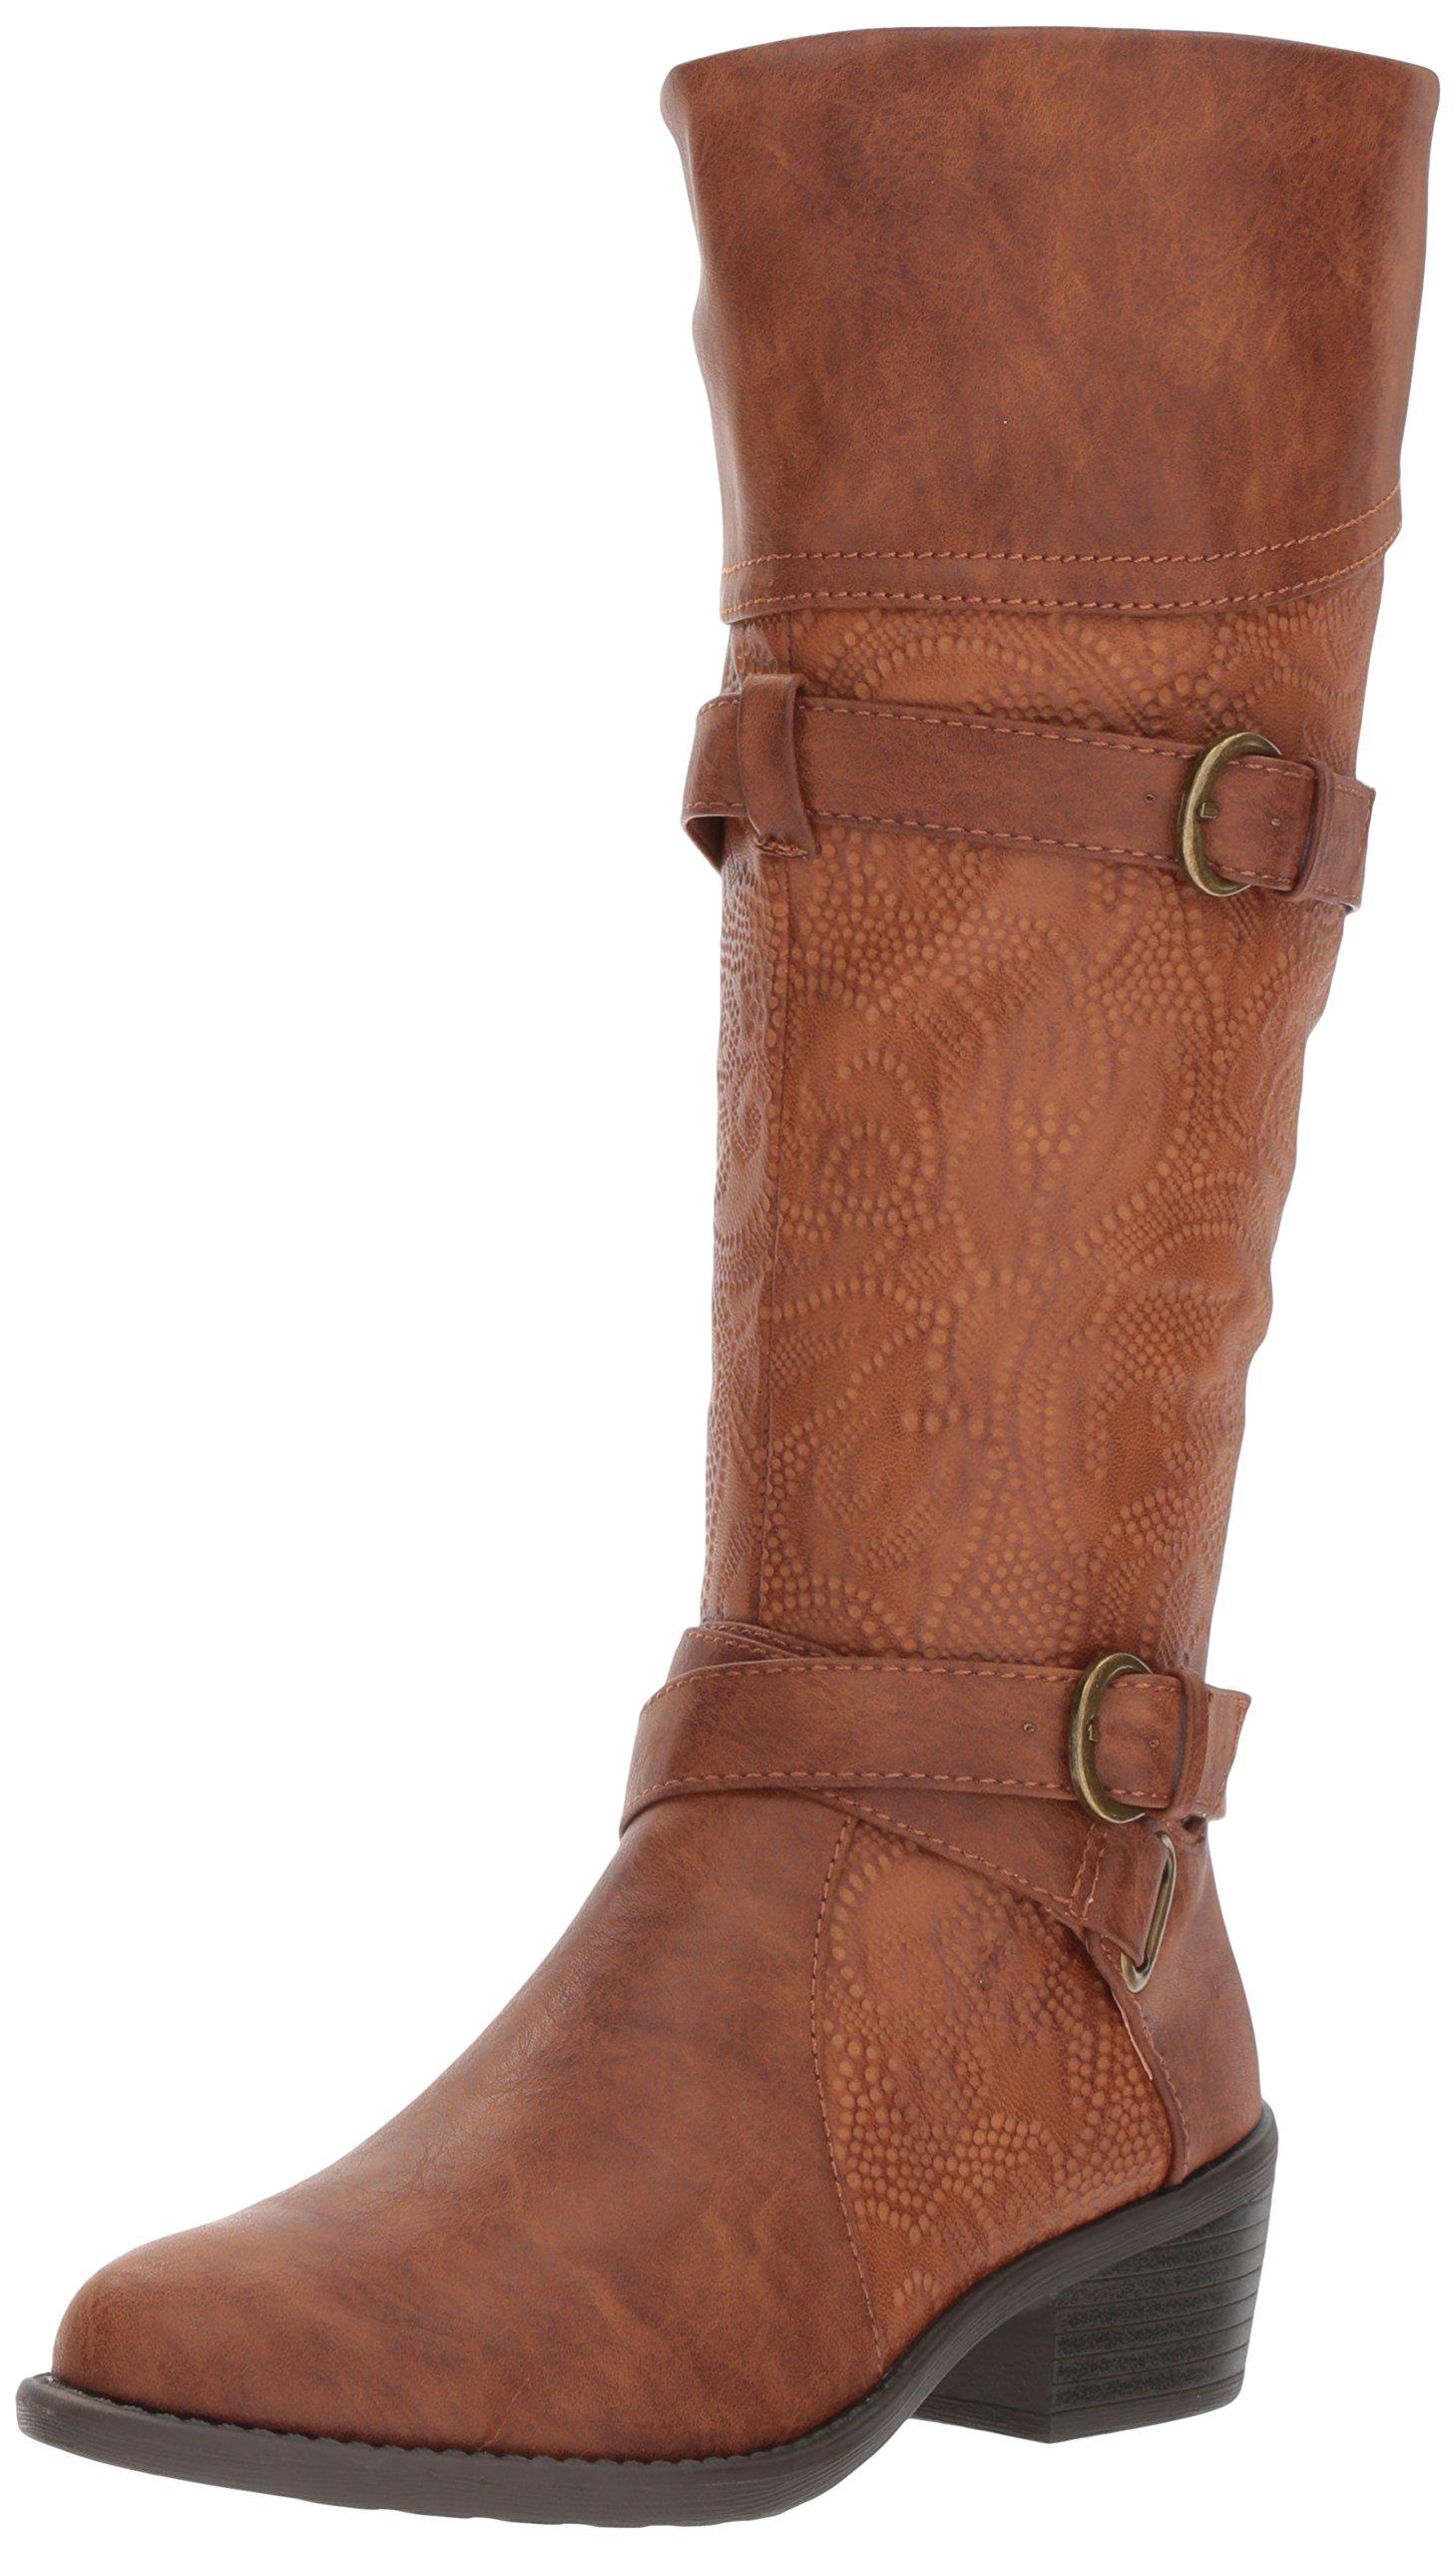 Easy Street Women's Kelsa Harness Boot, Tan/Embossed, 6 M US